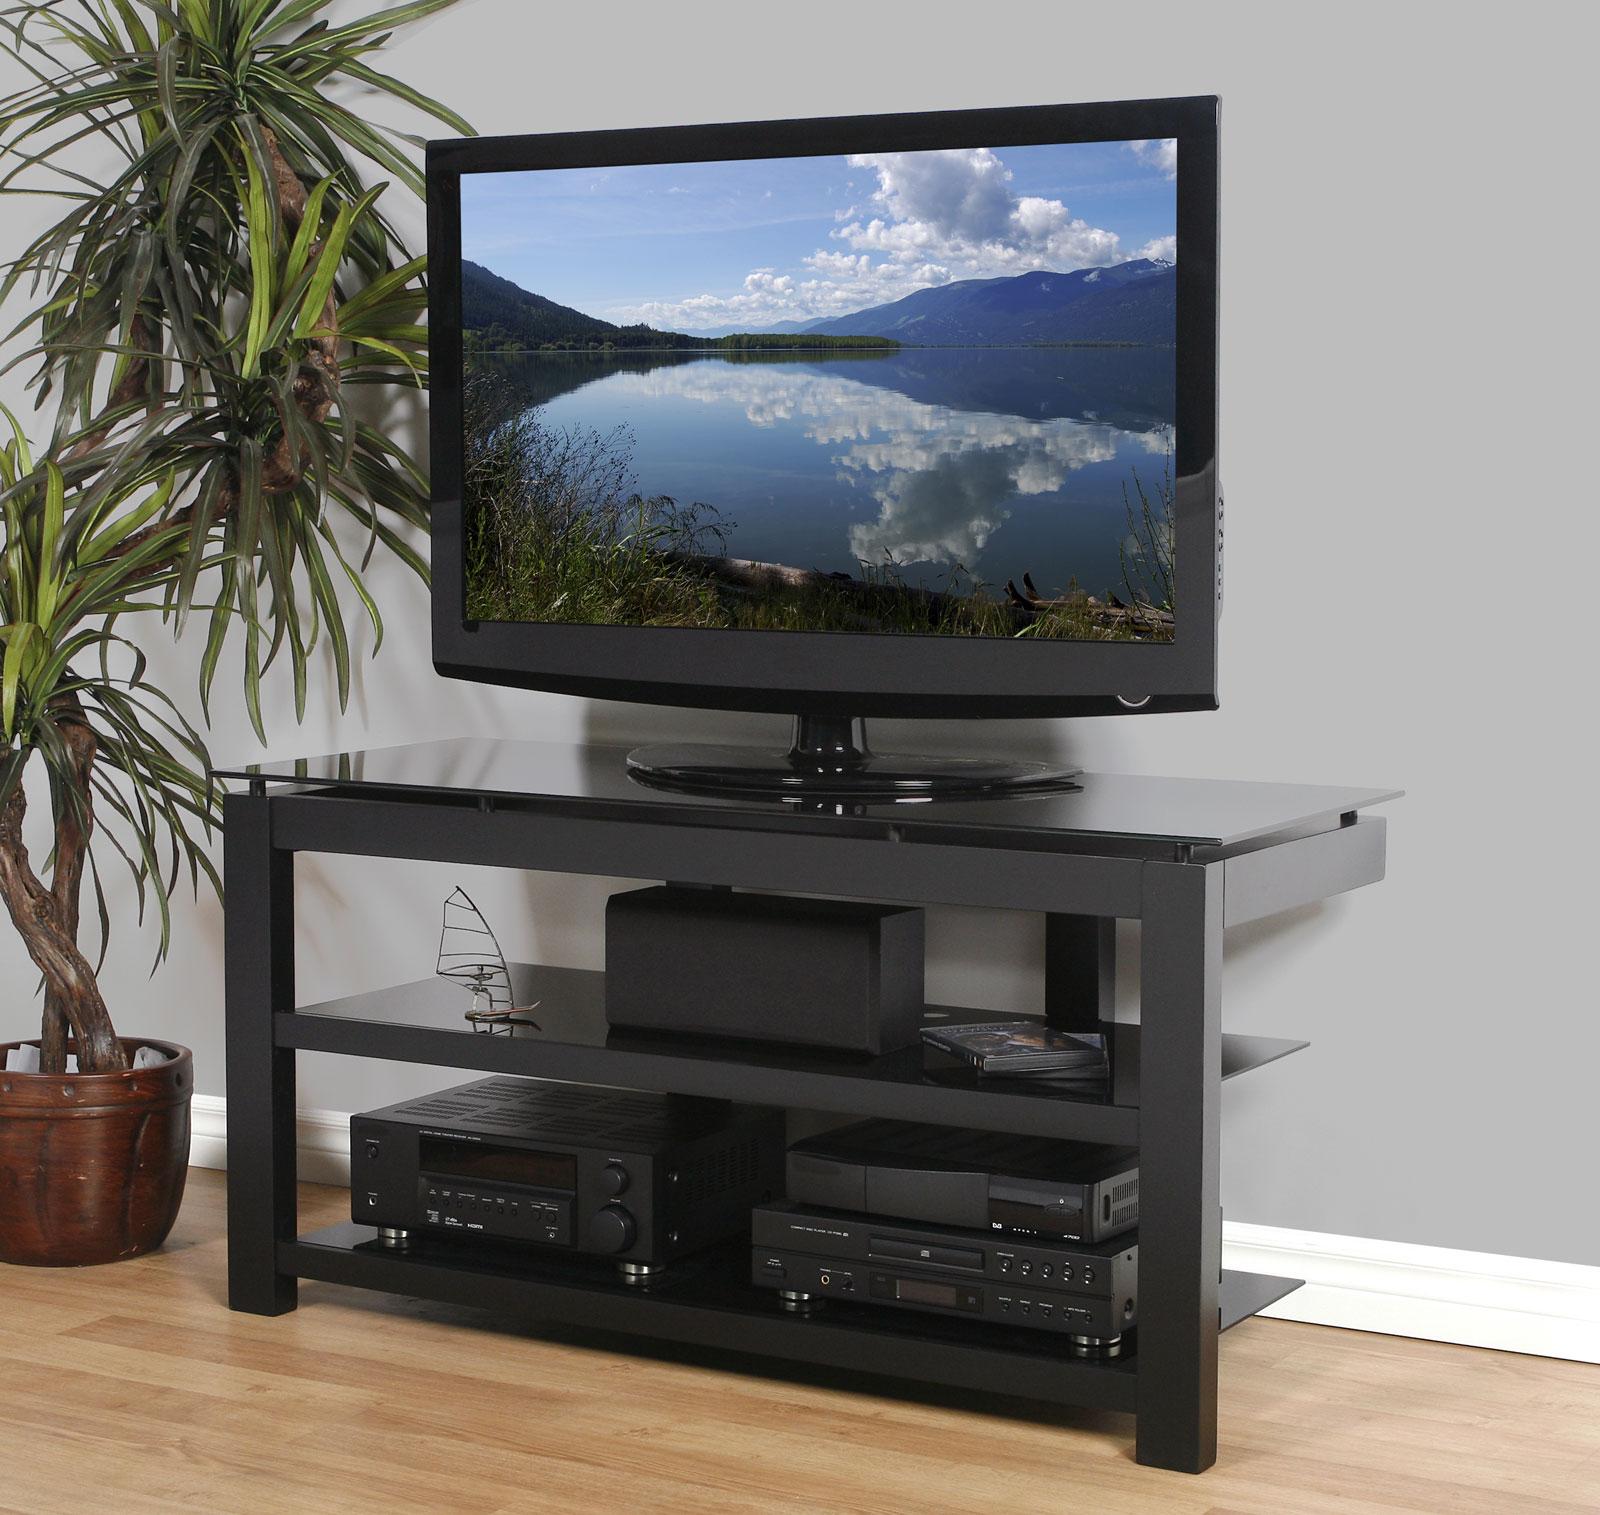 50 Inch Flat Screen TV Stand   Natural Wood Veneers And Black Glass Shelves  ...